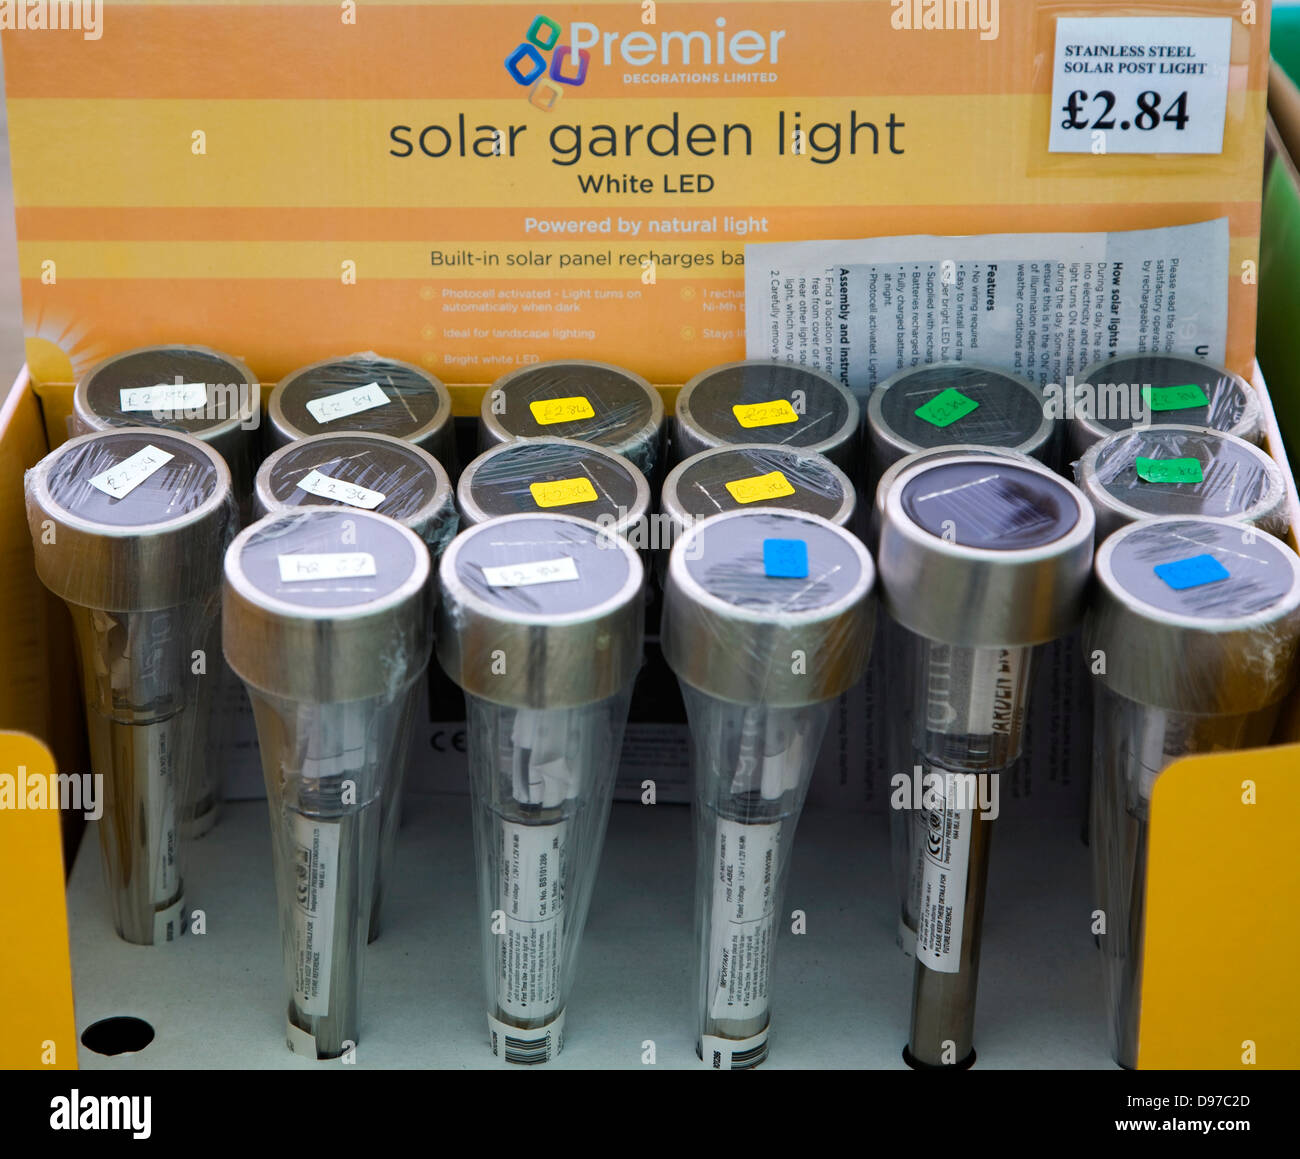 Display of solar garden lights, UK - Stock Image